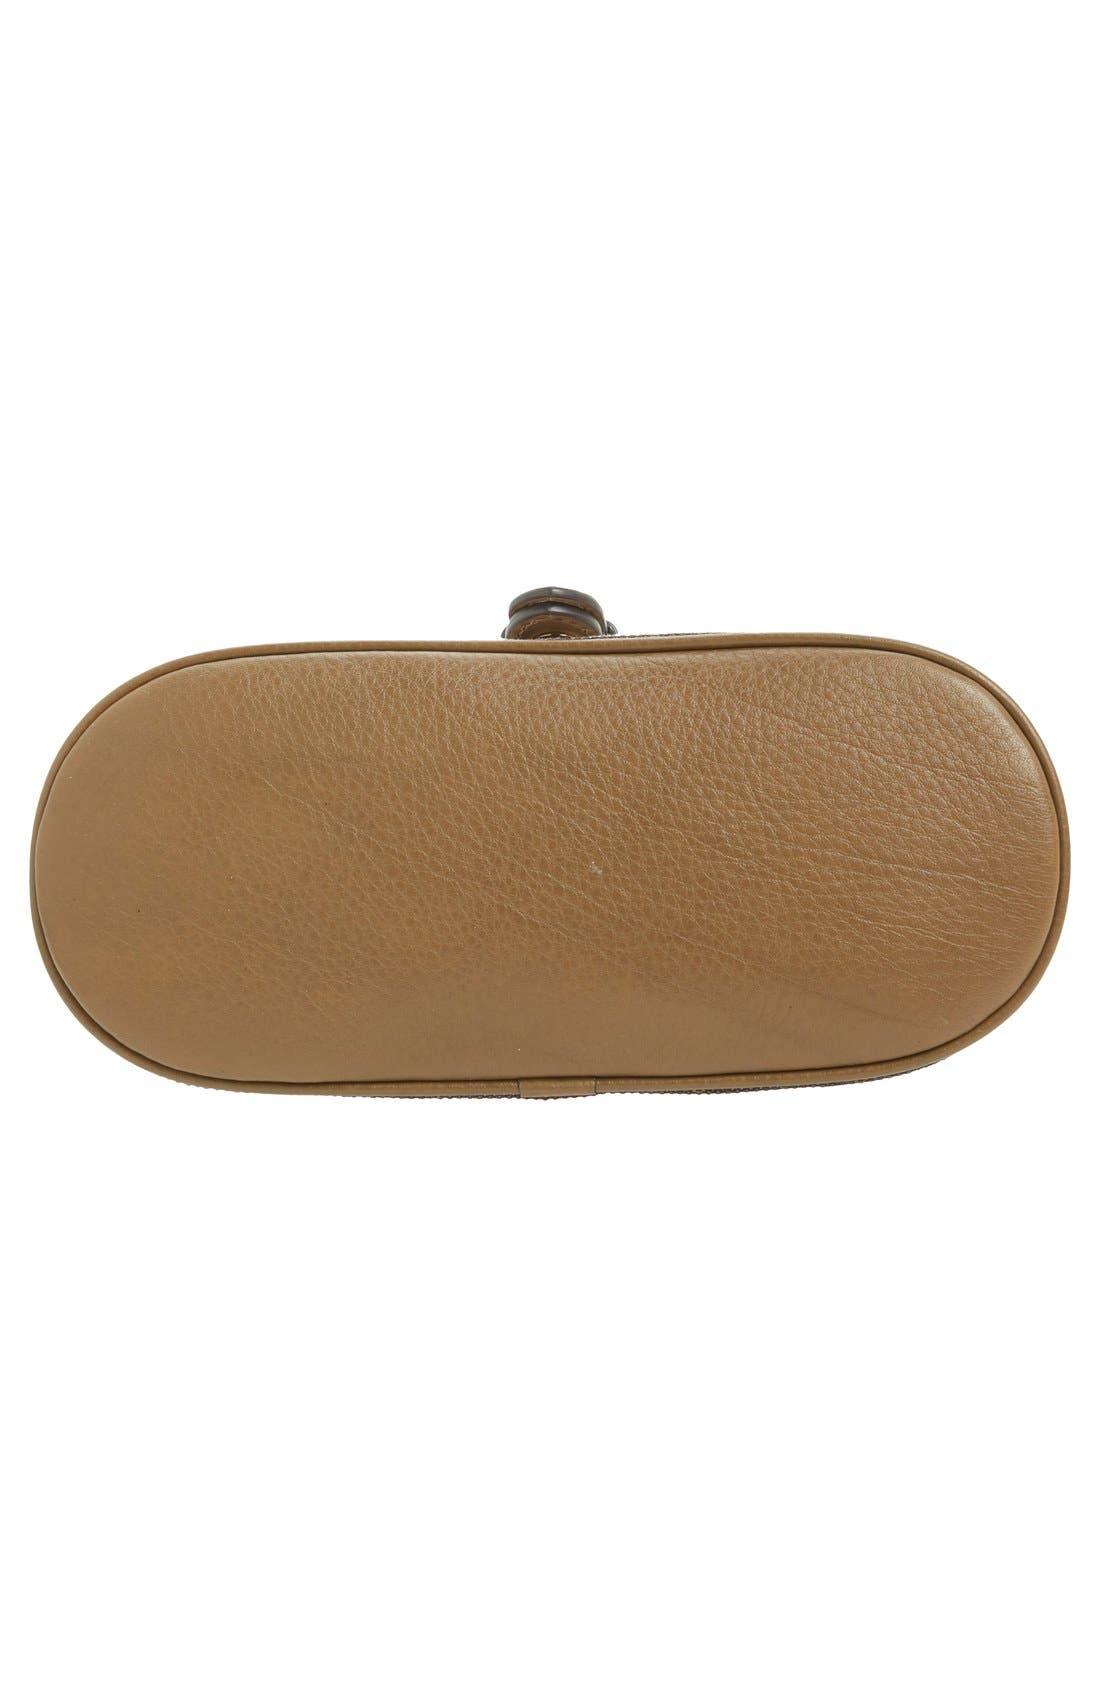 Alternate Image 2  - Burberry 'Small Gowan' Crossbody Bag